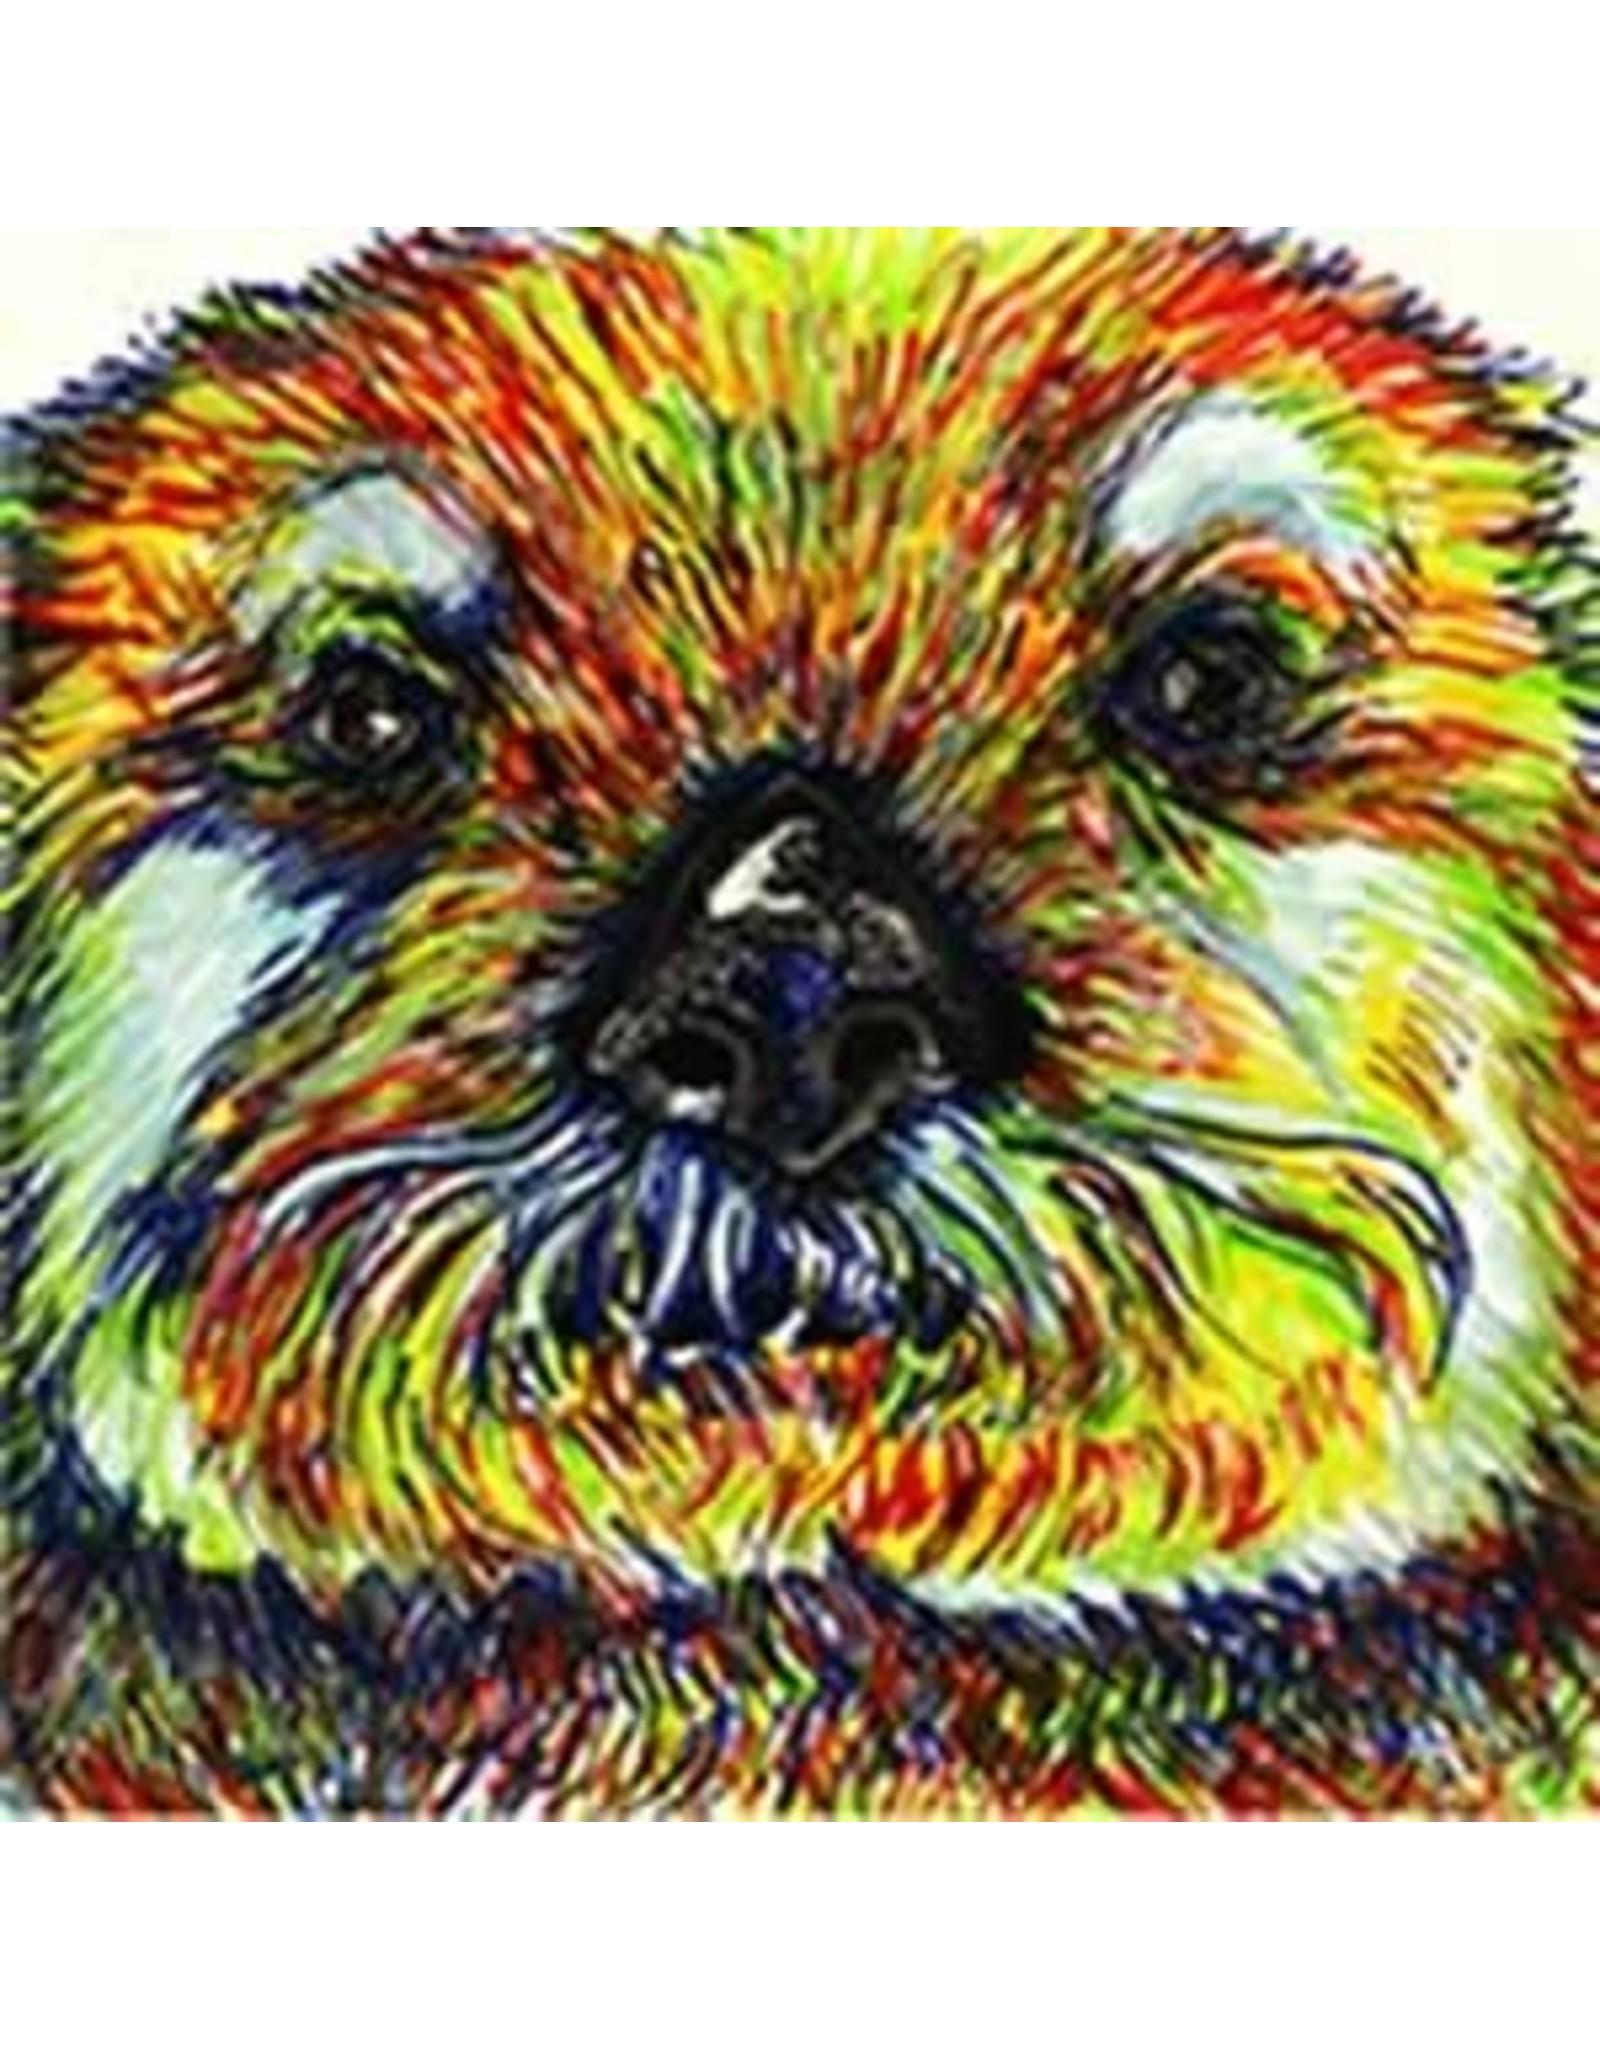 Katie Sevigny Otter Face | Katie Sevigny